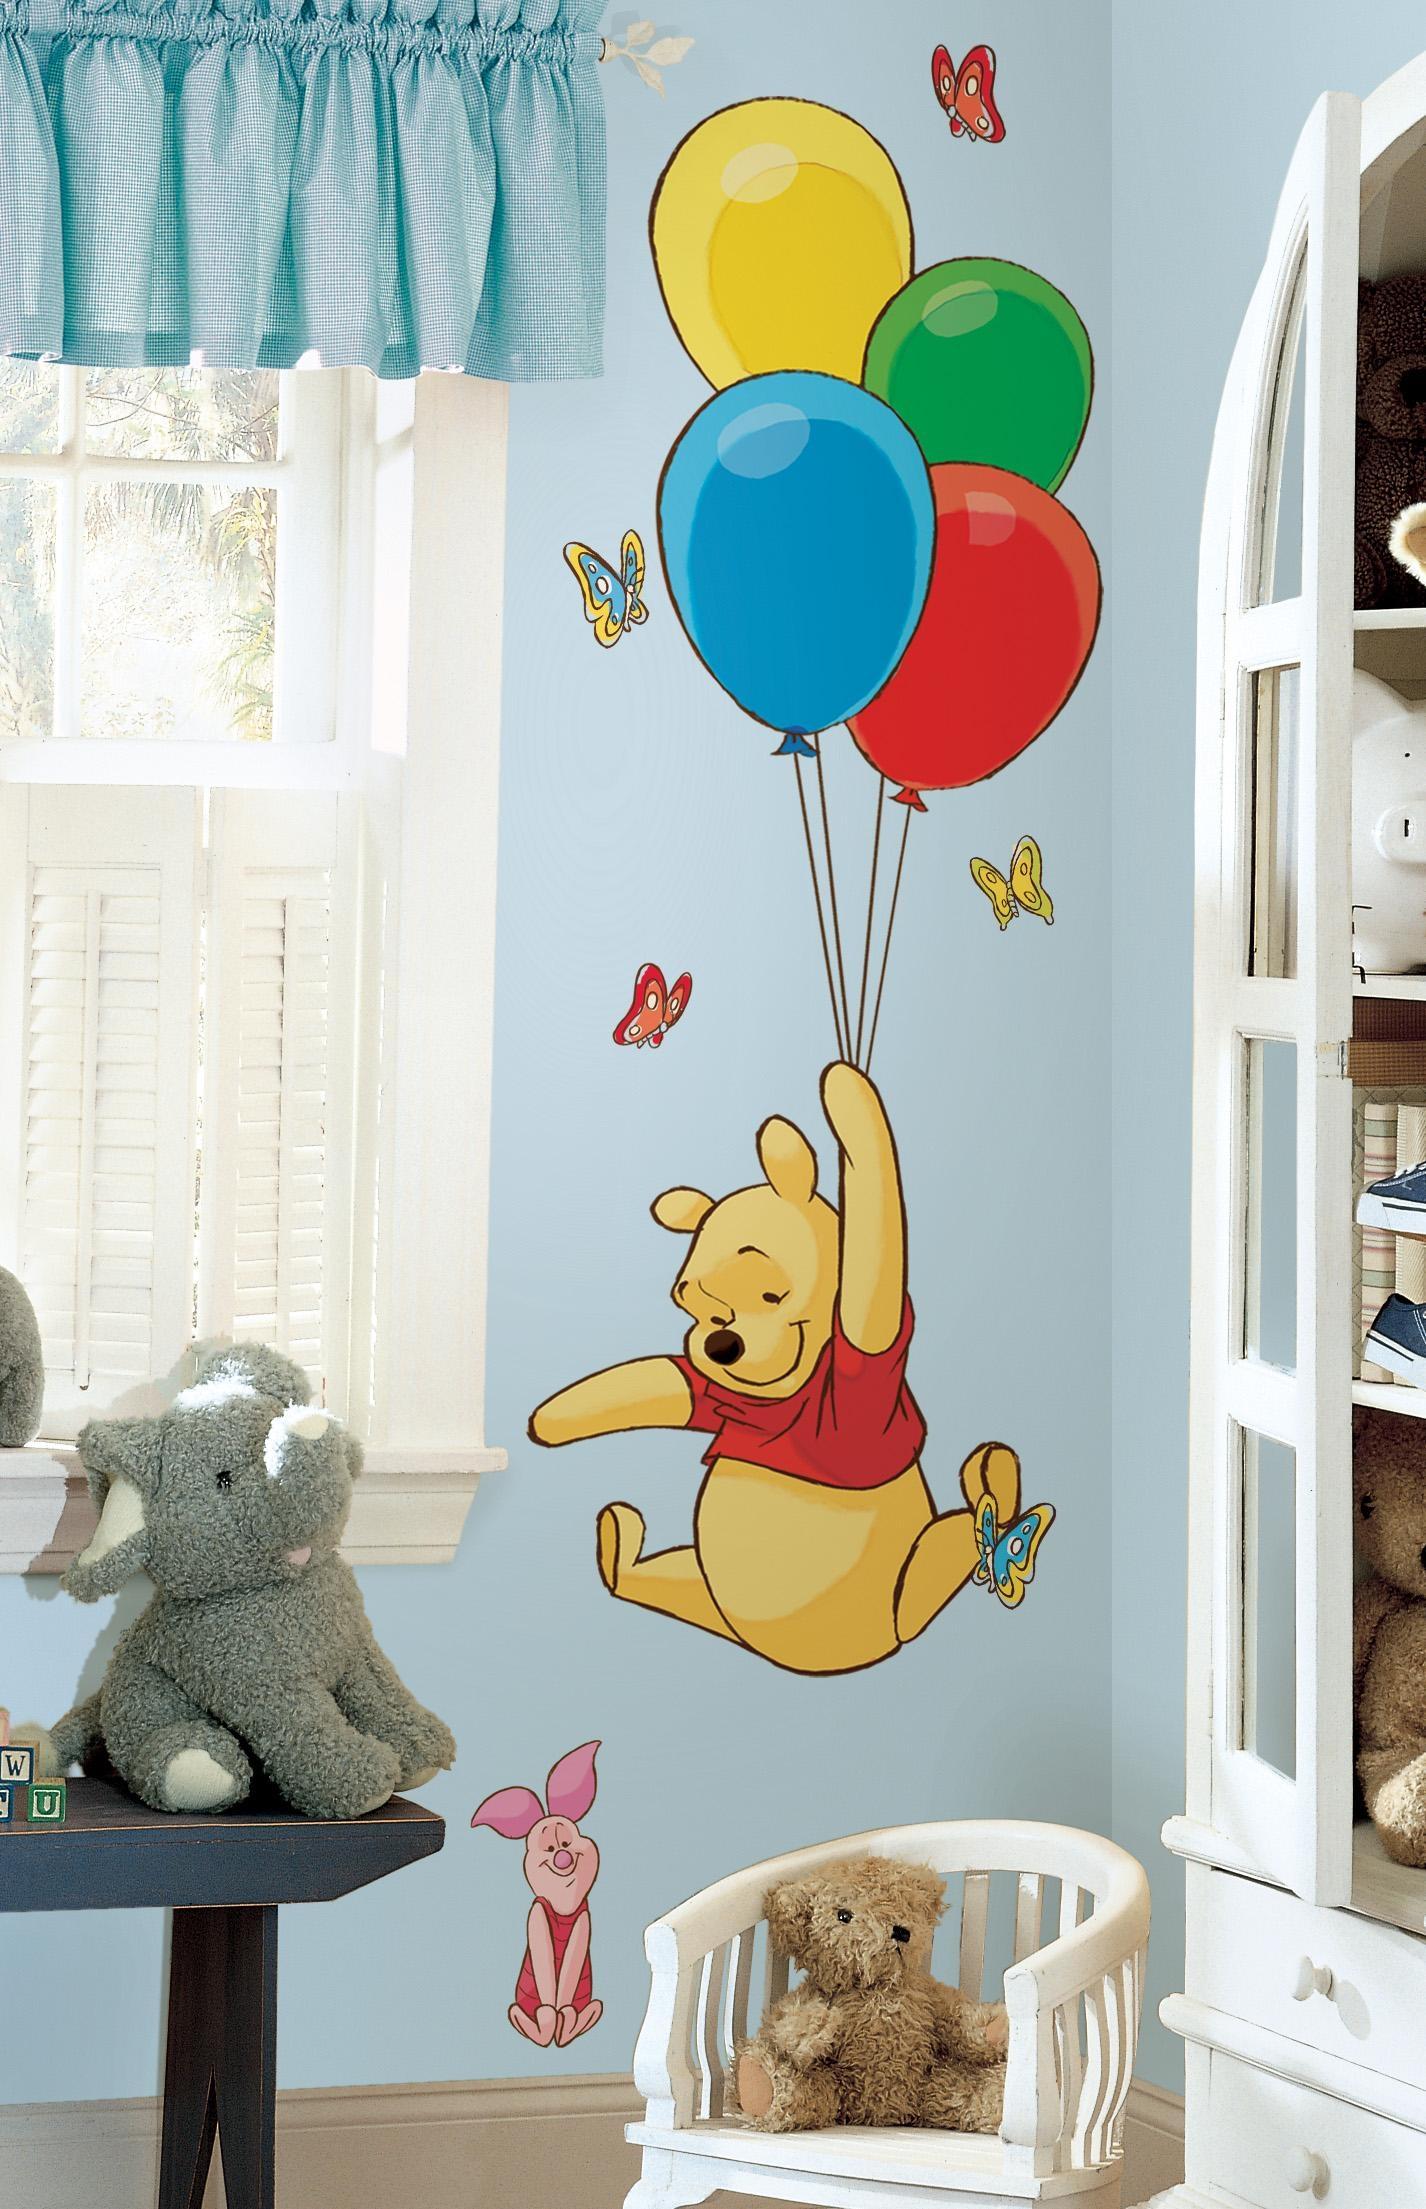 Winnie The Pooh Wall Art Superb Large Wall Art On Ikea Wall Art Regarding Winnie The Pooh Vinyl Wall Art (Image 19 of 20)